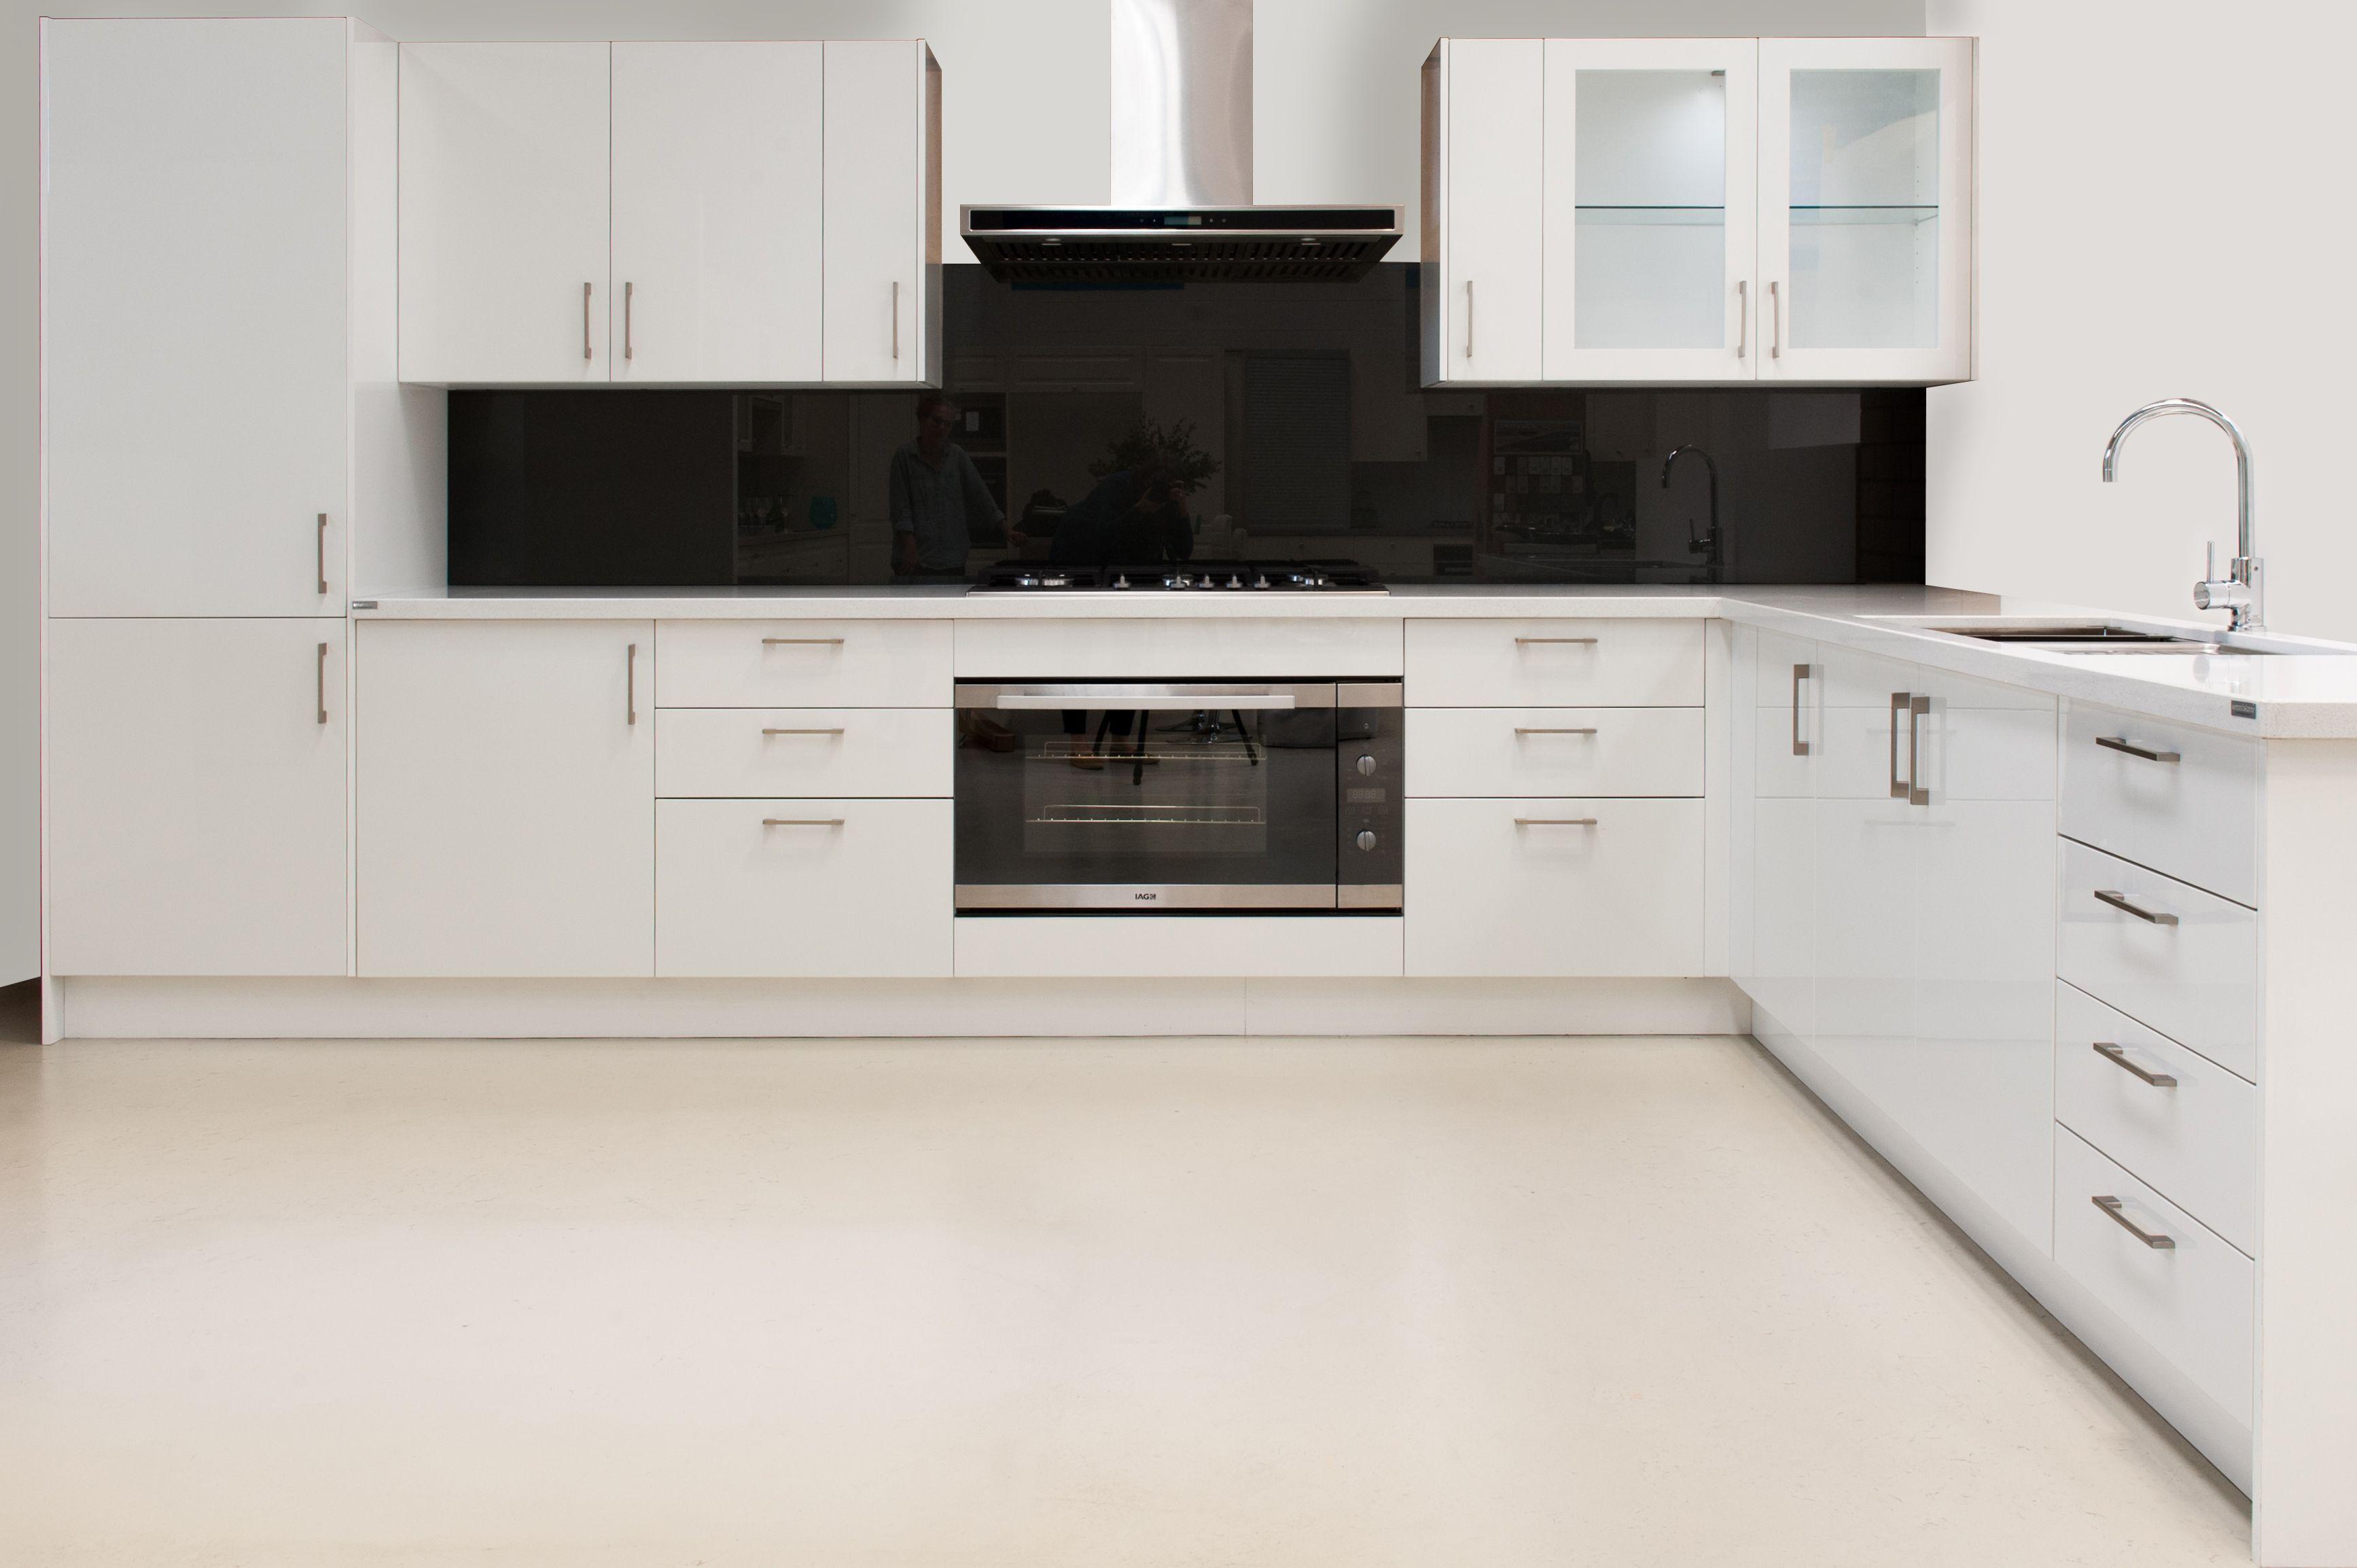 Flat pack kitchens at Kitchen Shack | Flat Pack Kitchens | Pinterest ...